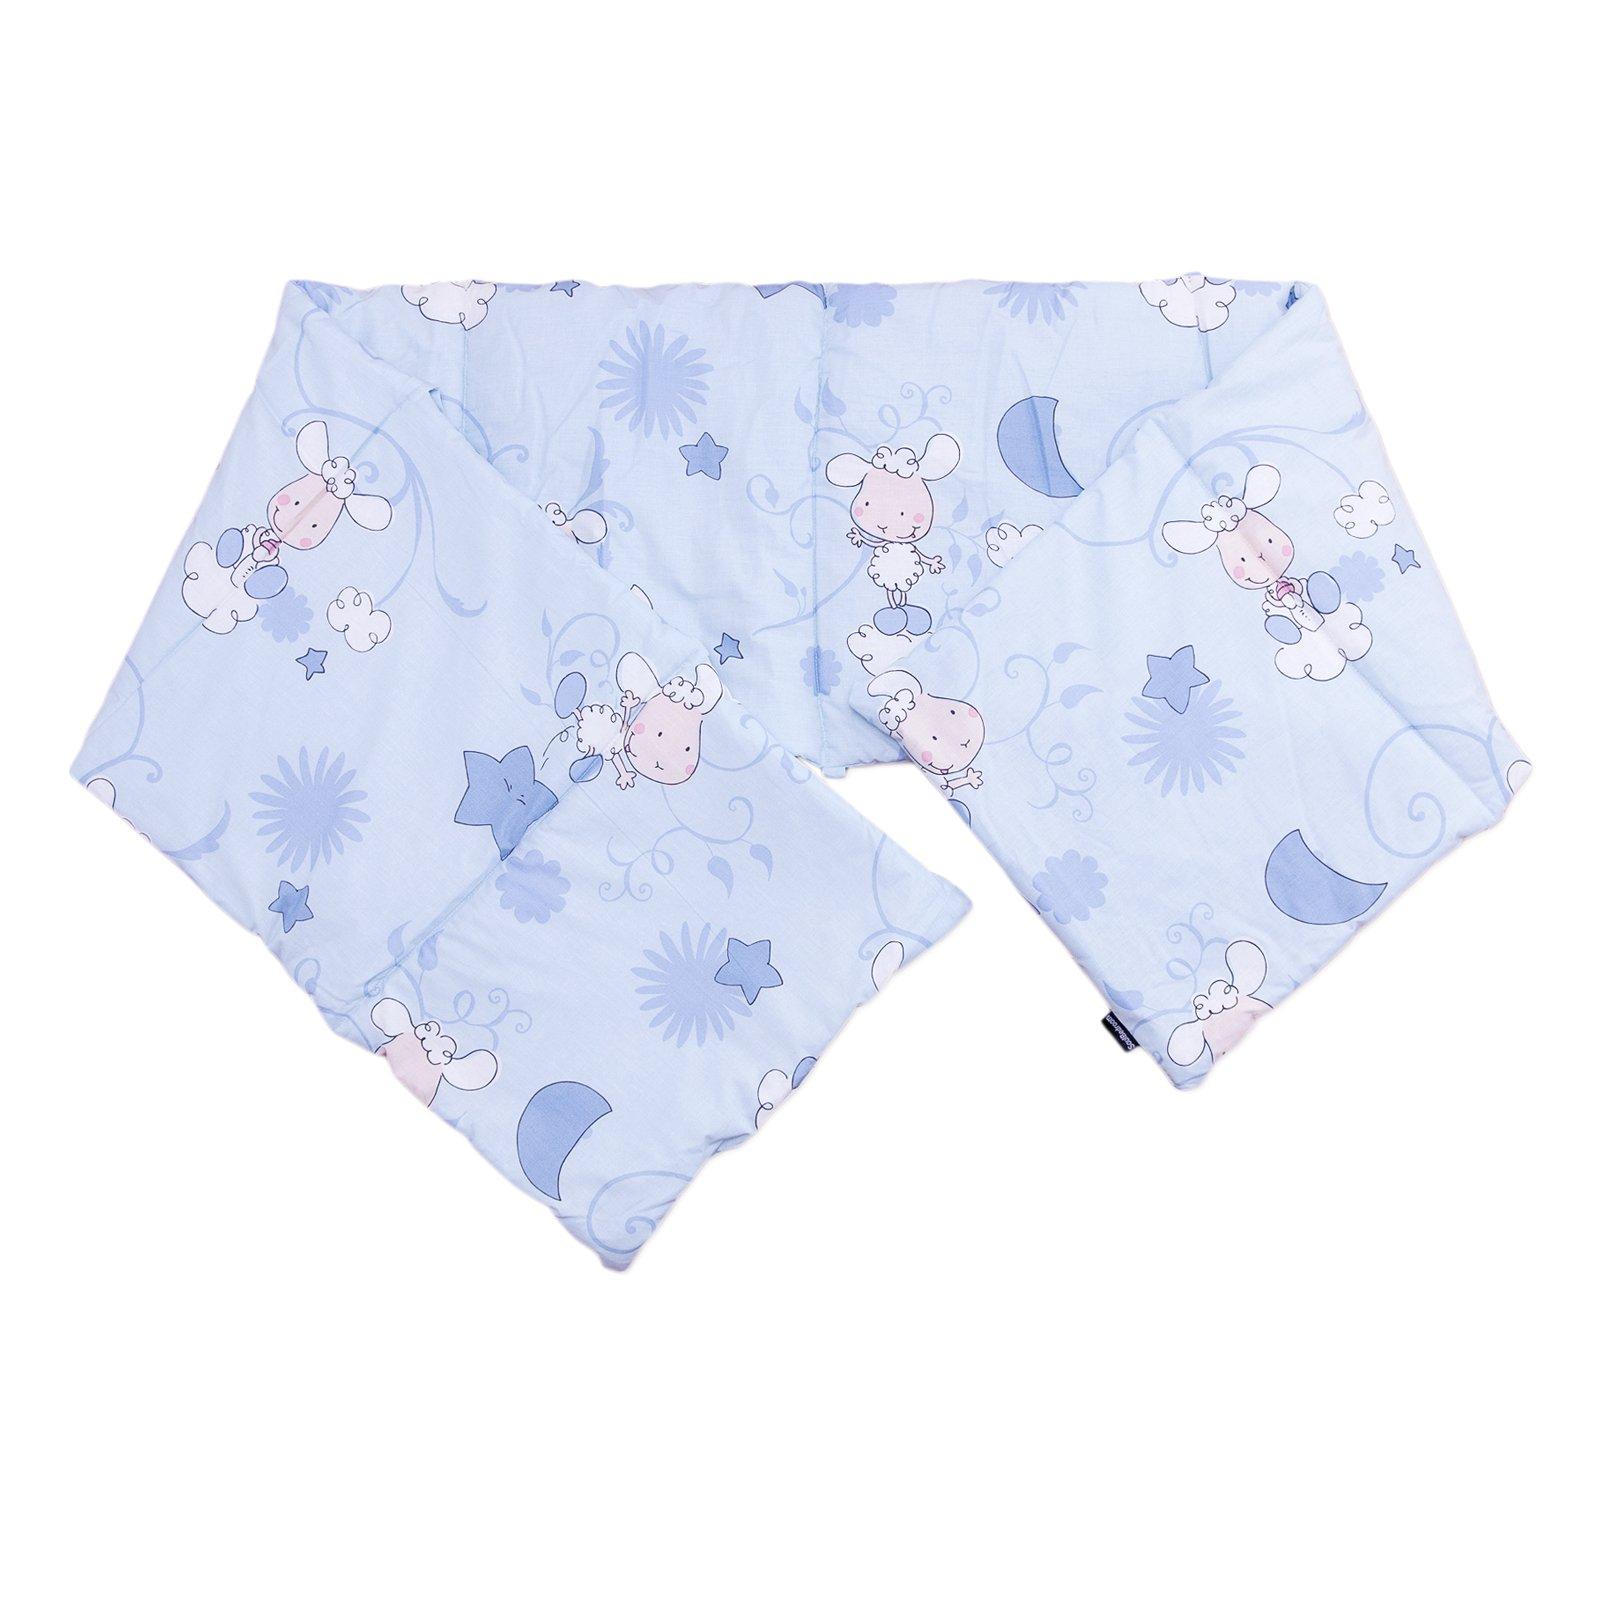 Baby Happy Lambs (Blue) / SoulBedroom Cotton Cot Bumper Pad Half (210x40 cm)